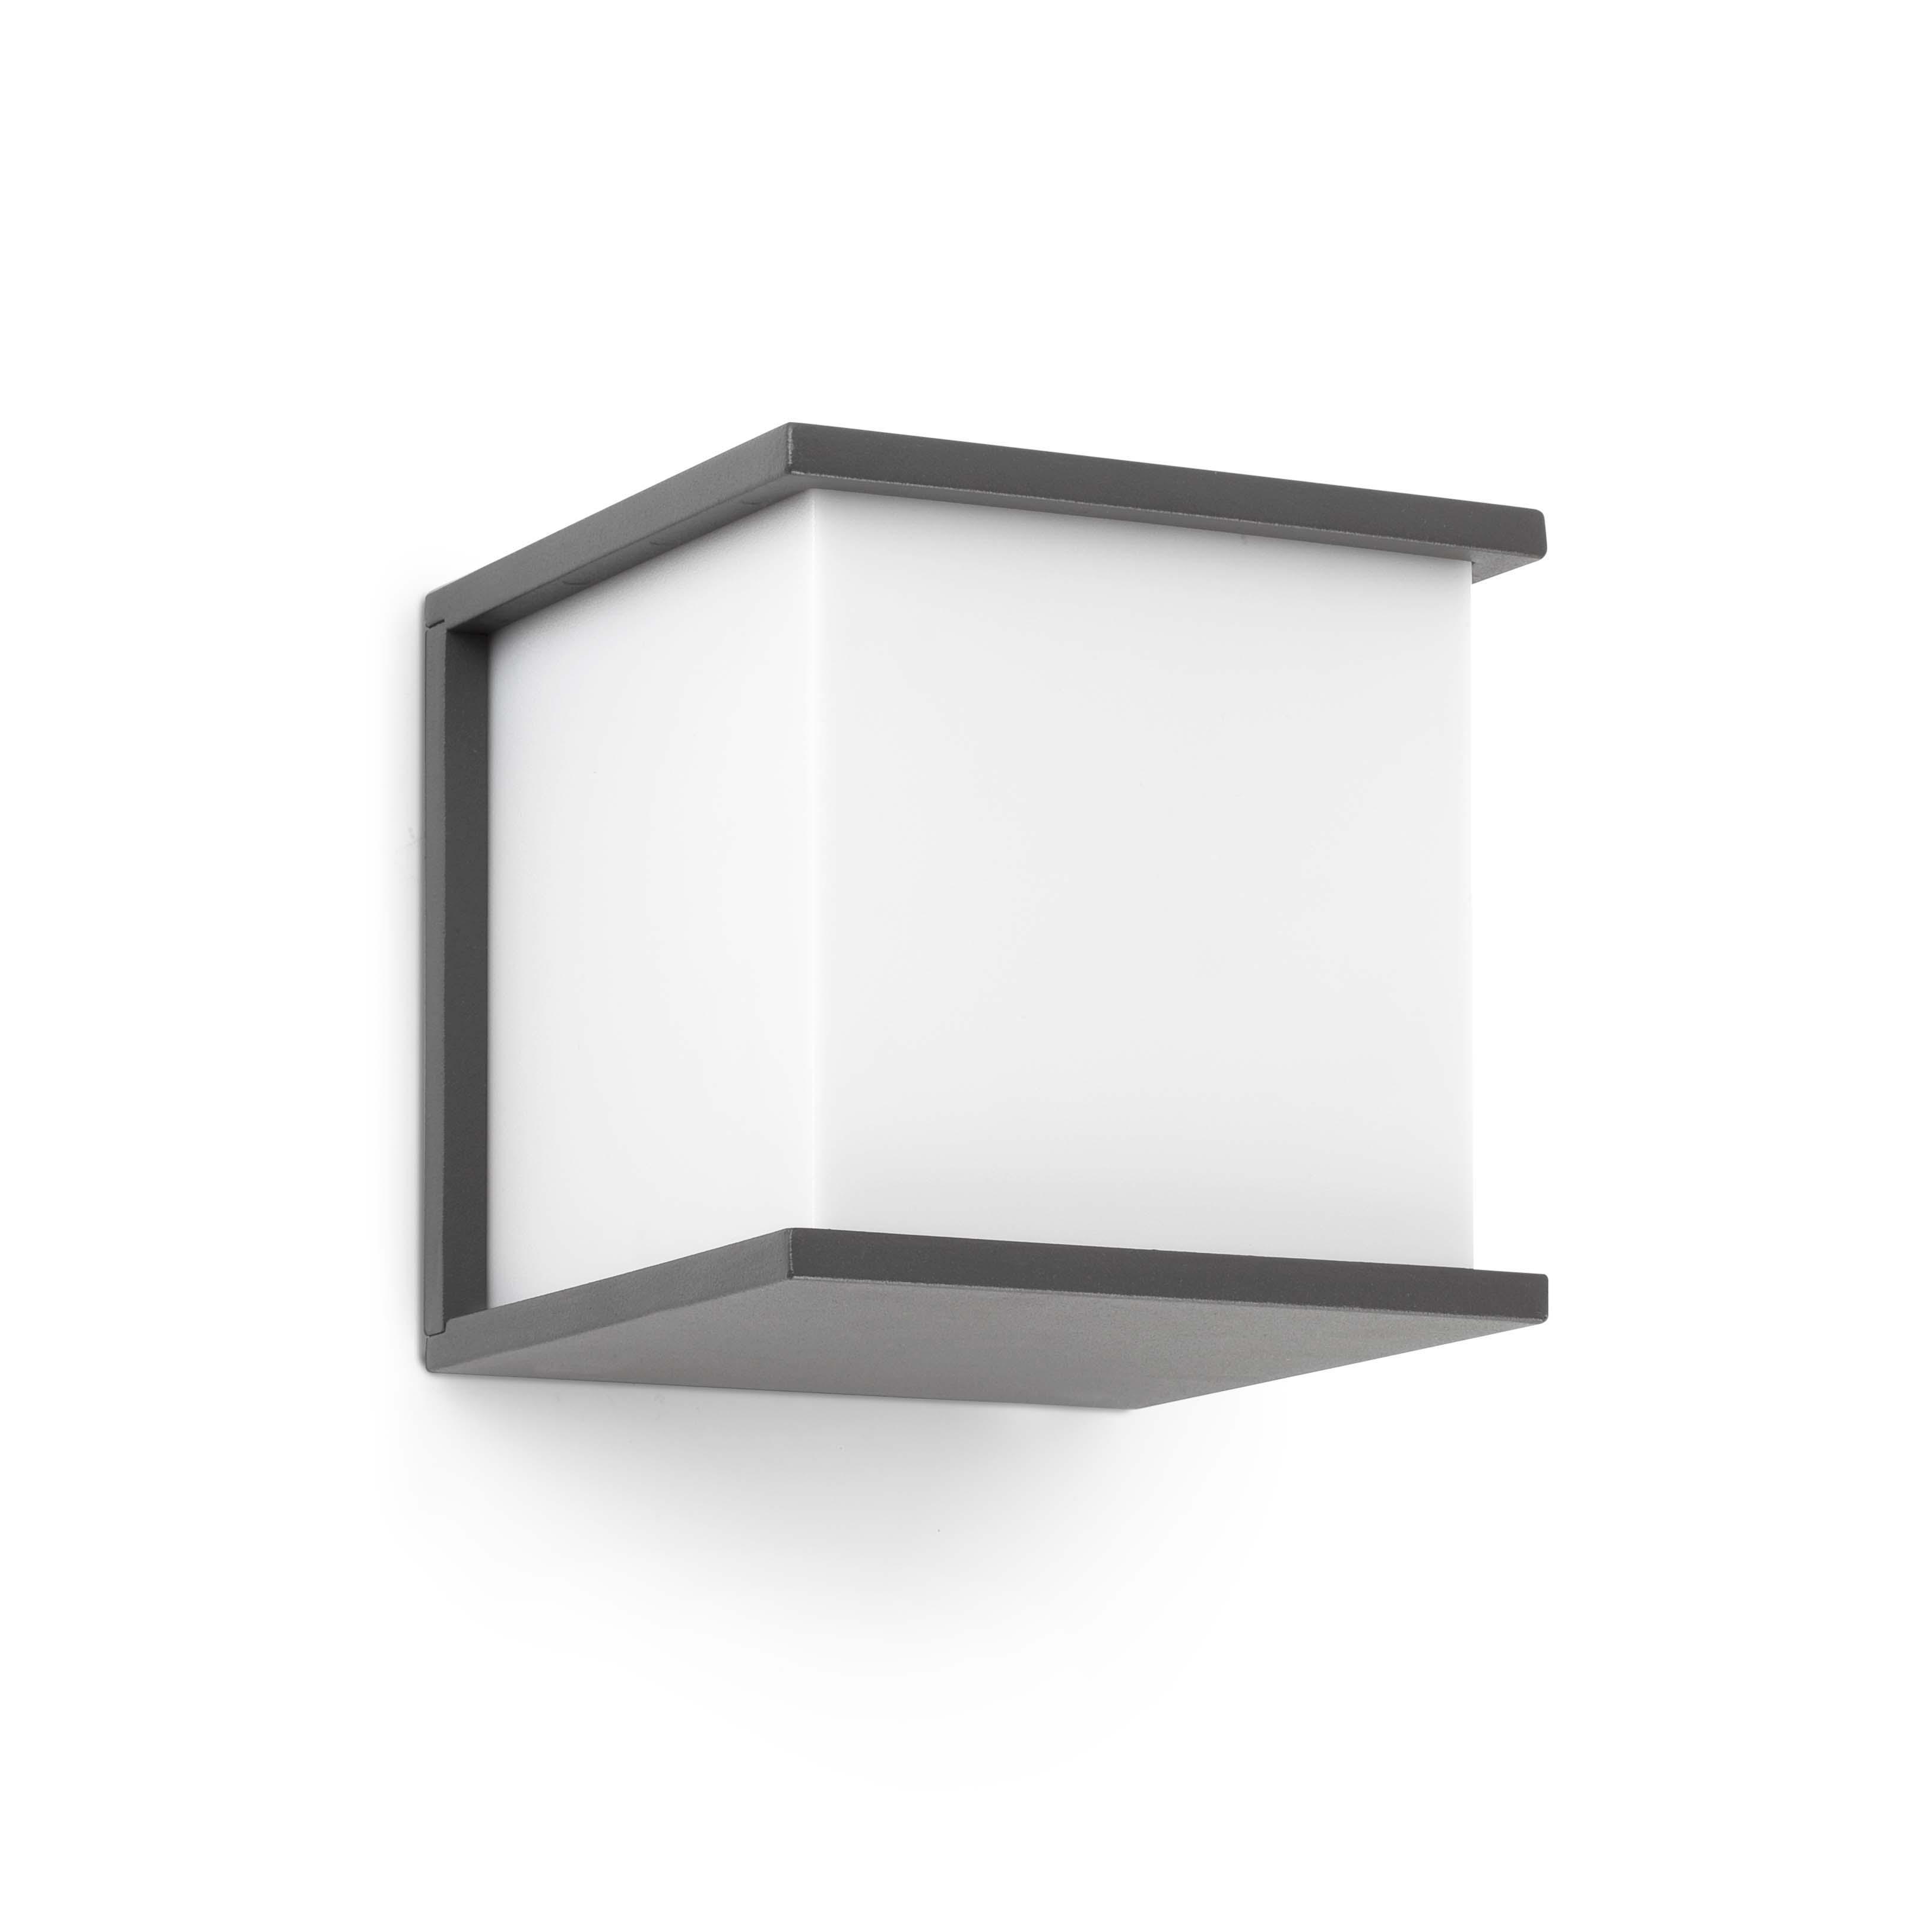 Kubick Wall Lamp Outdoor 1xE27 60w Grey oscuro